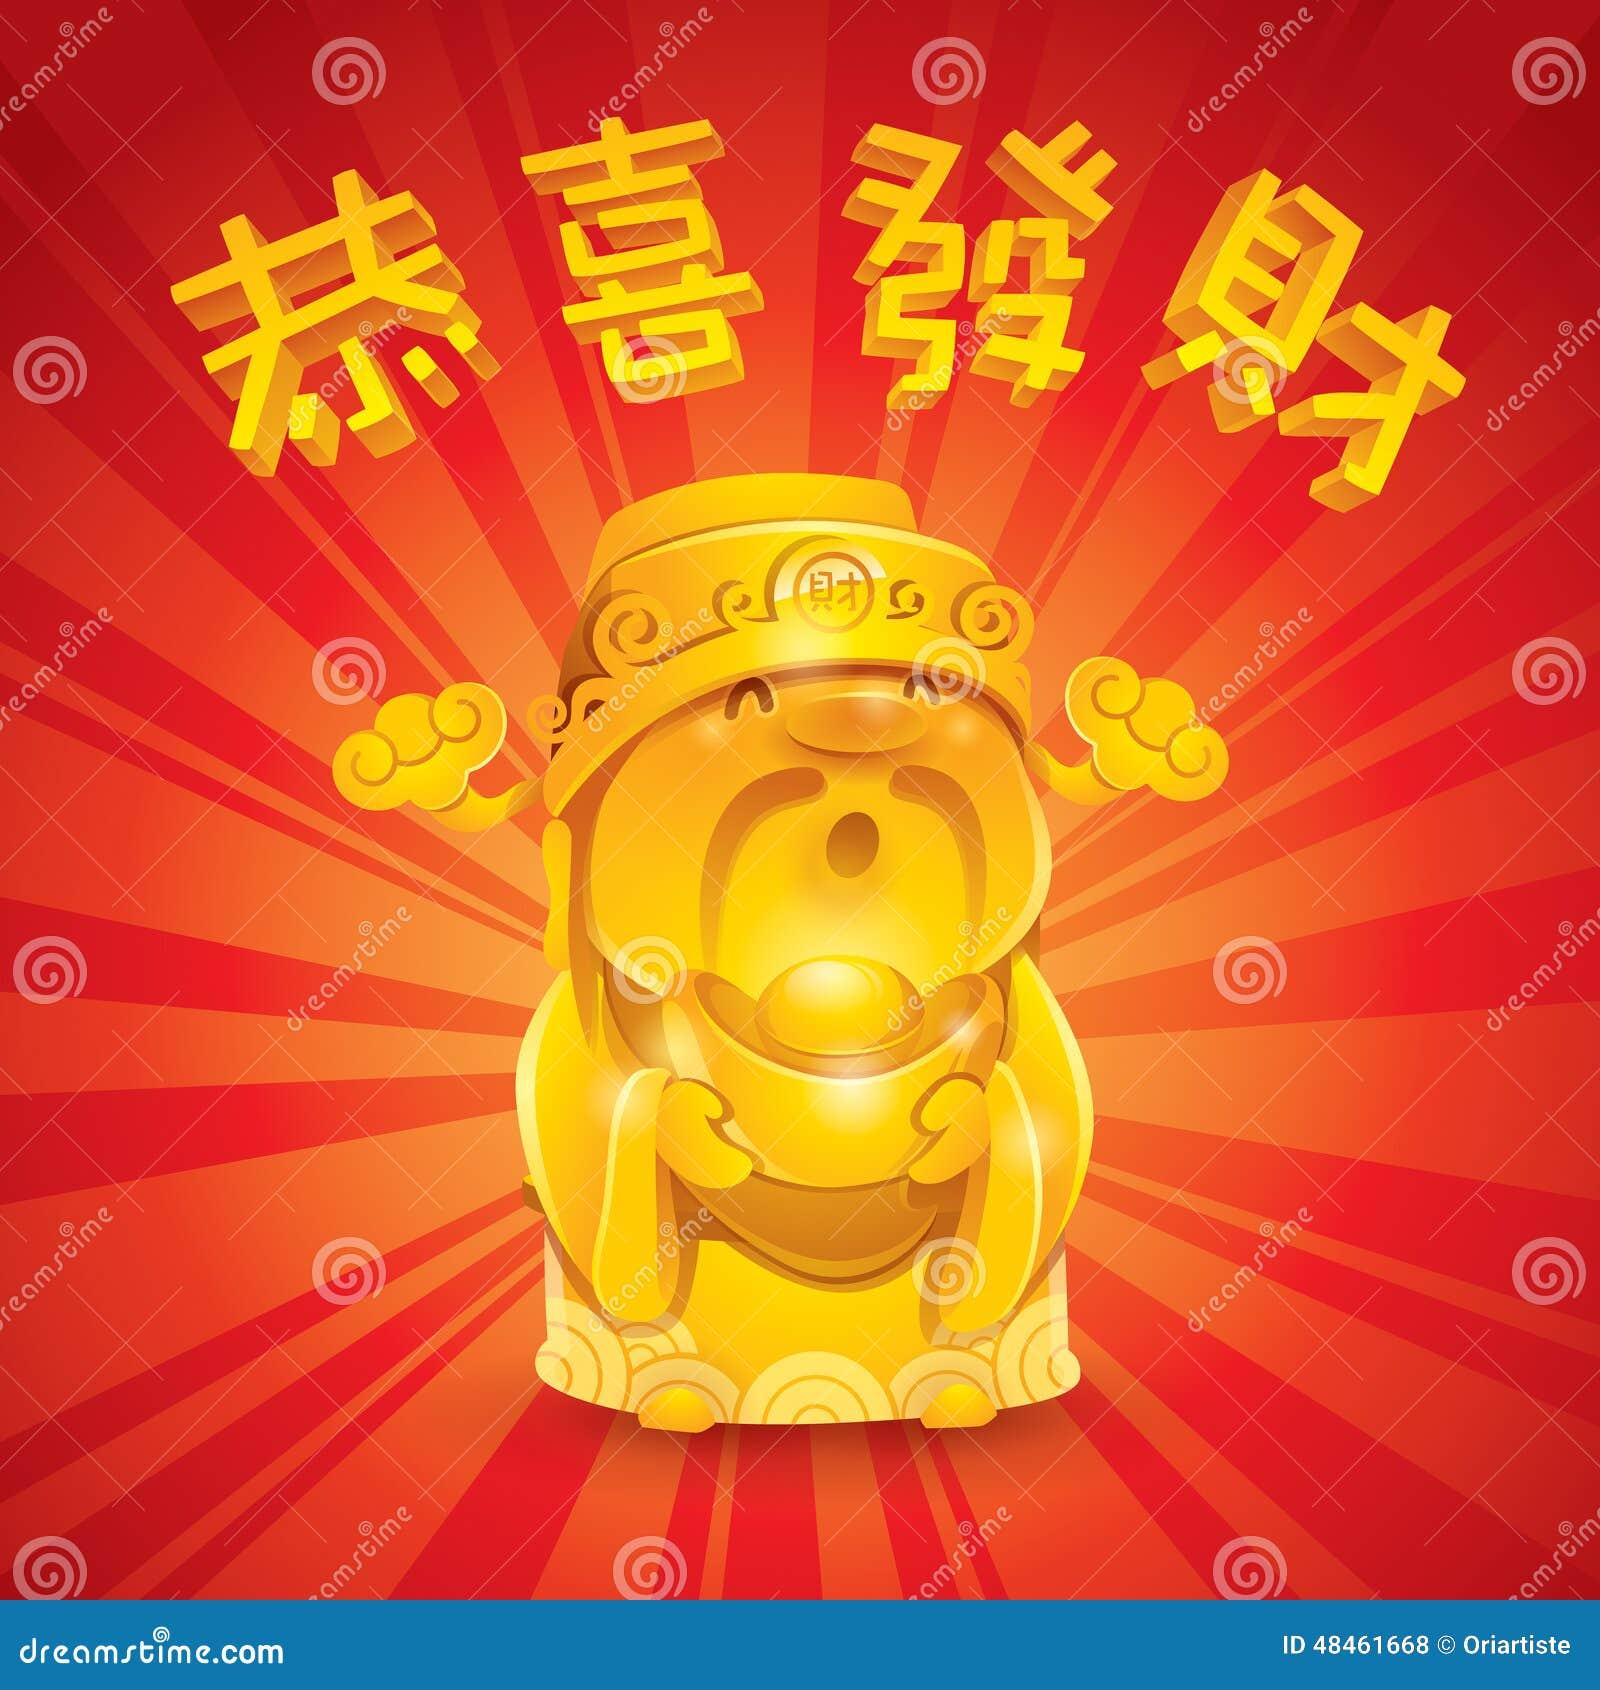 Spiele Fa Cai Shen M - Video Slots Online